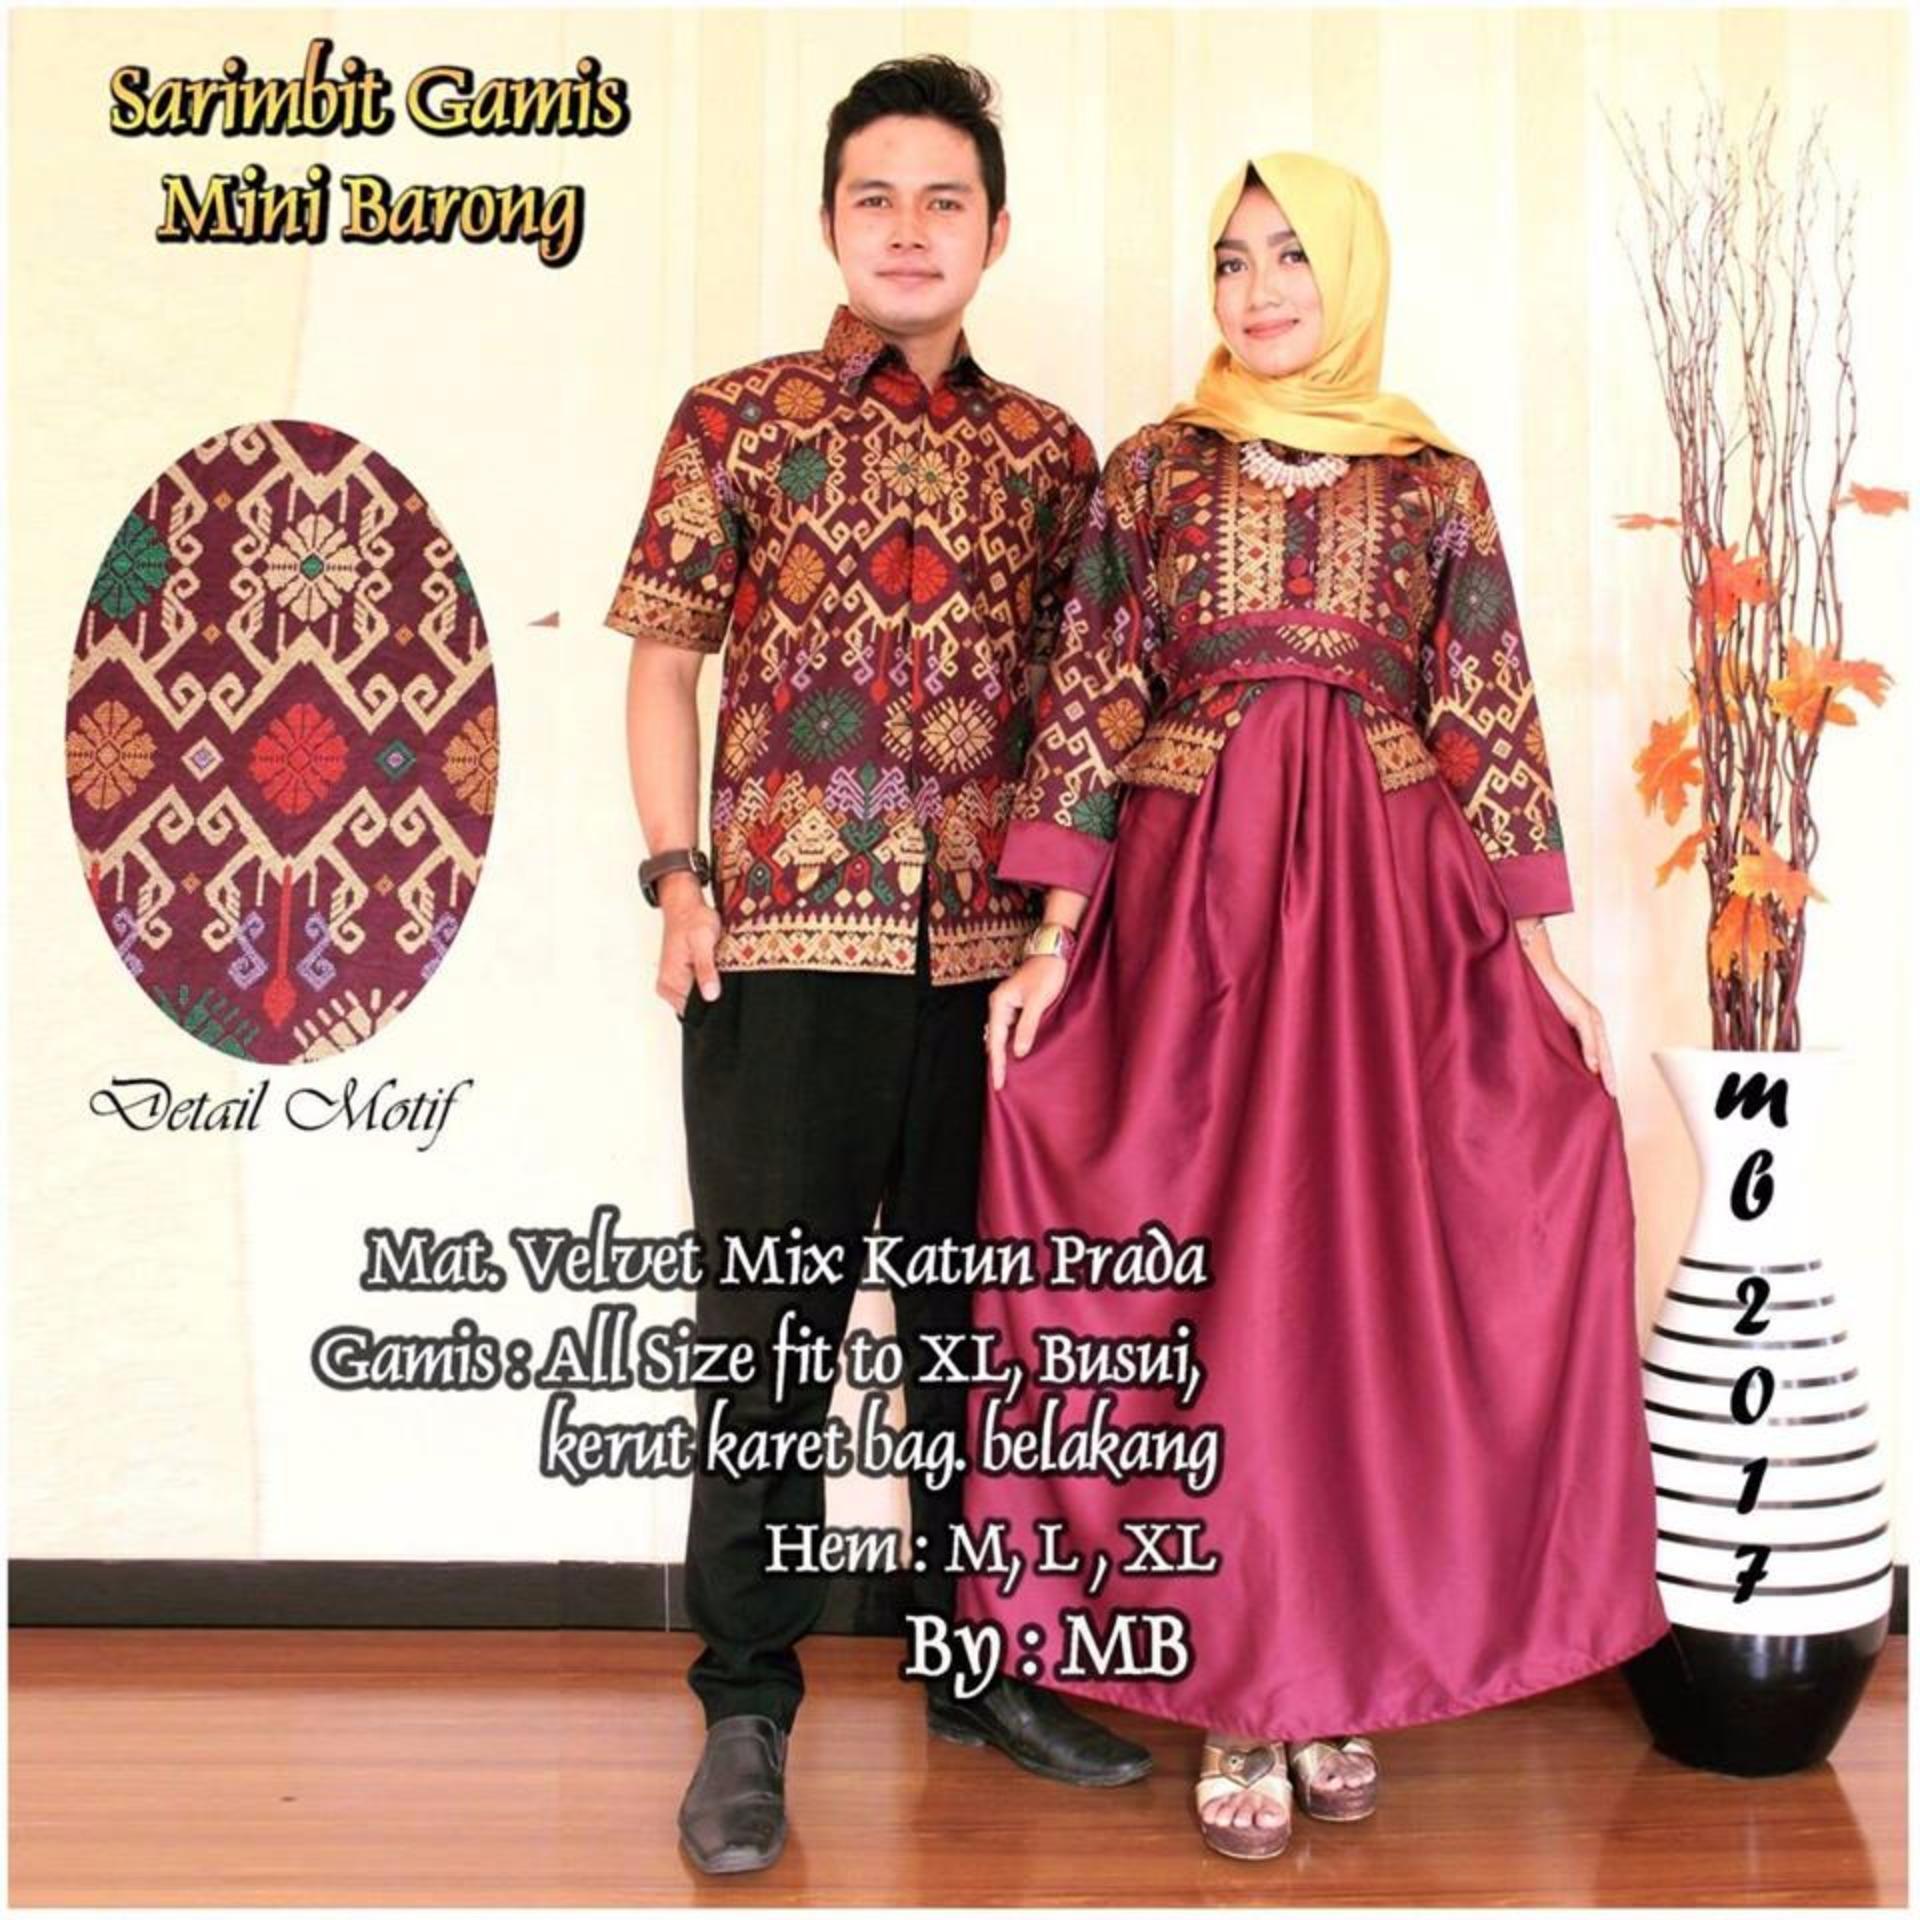 PENAWARAN Batik Couple   Batik Sarimbit Gamis Mini Barong - MERAH ... 958e97f4ec